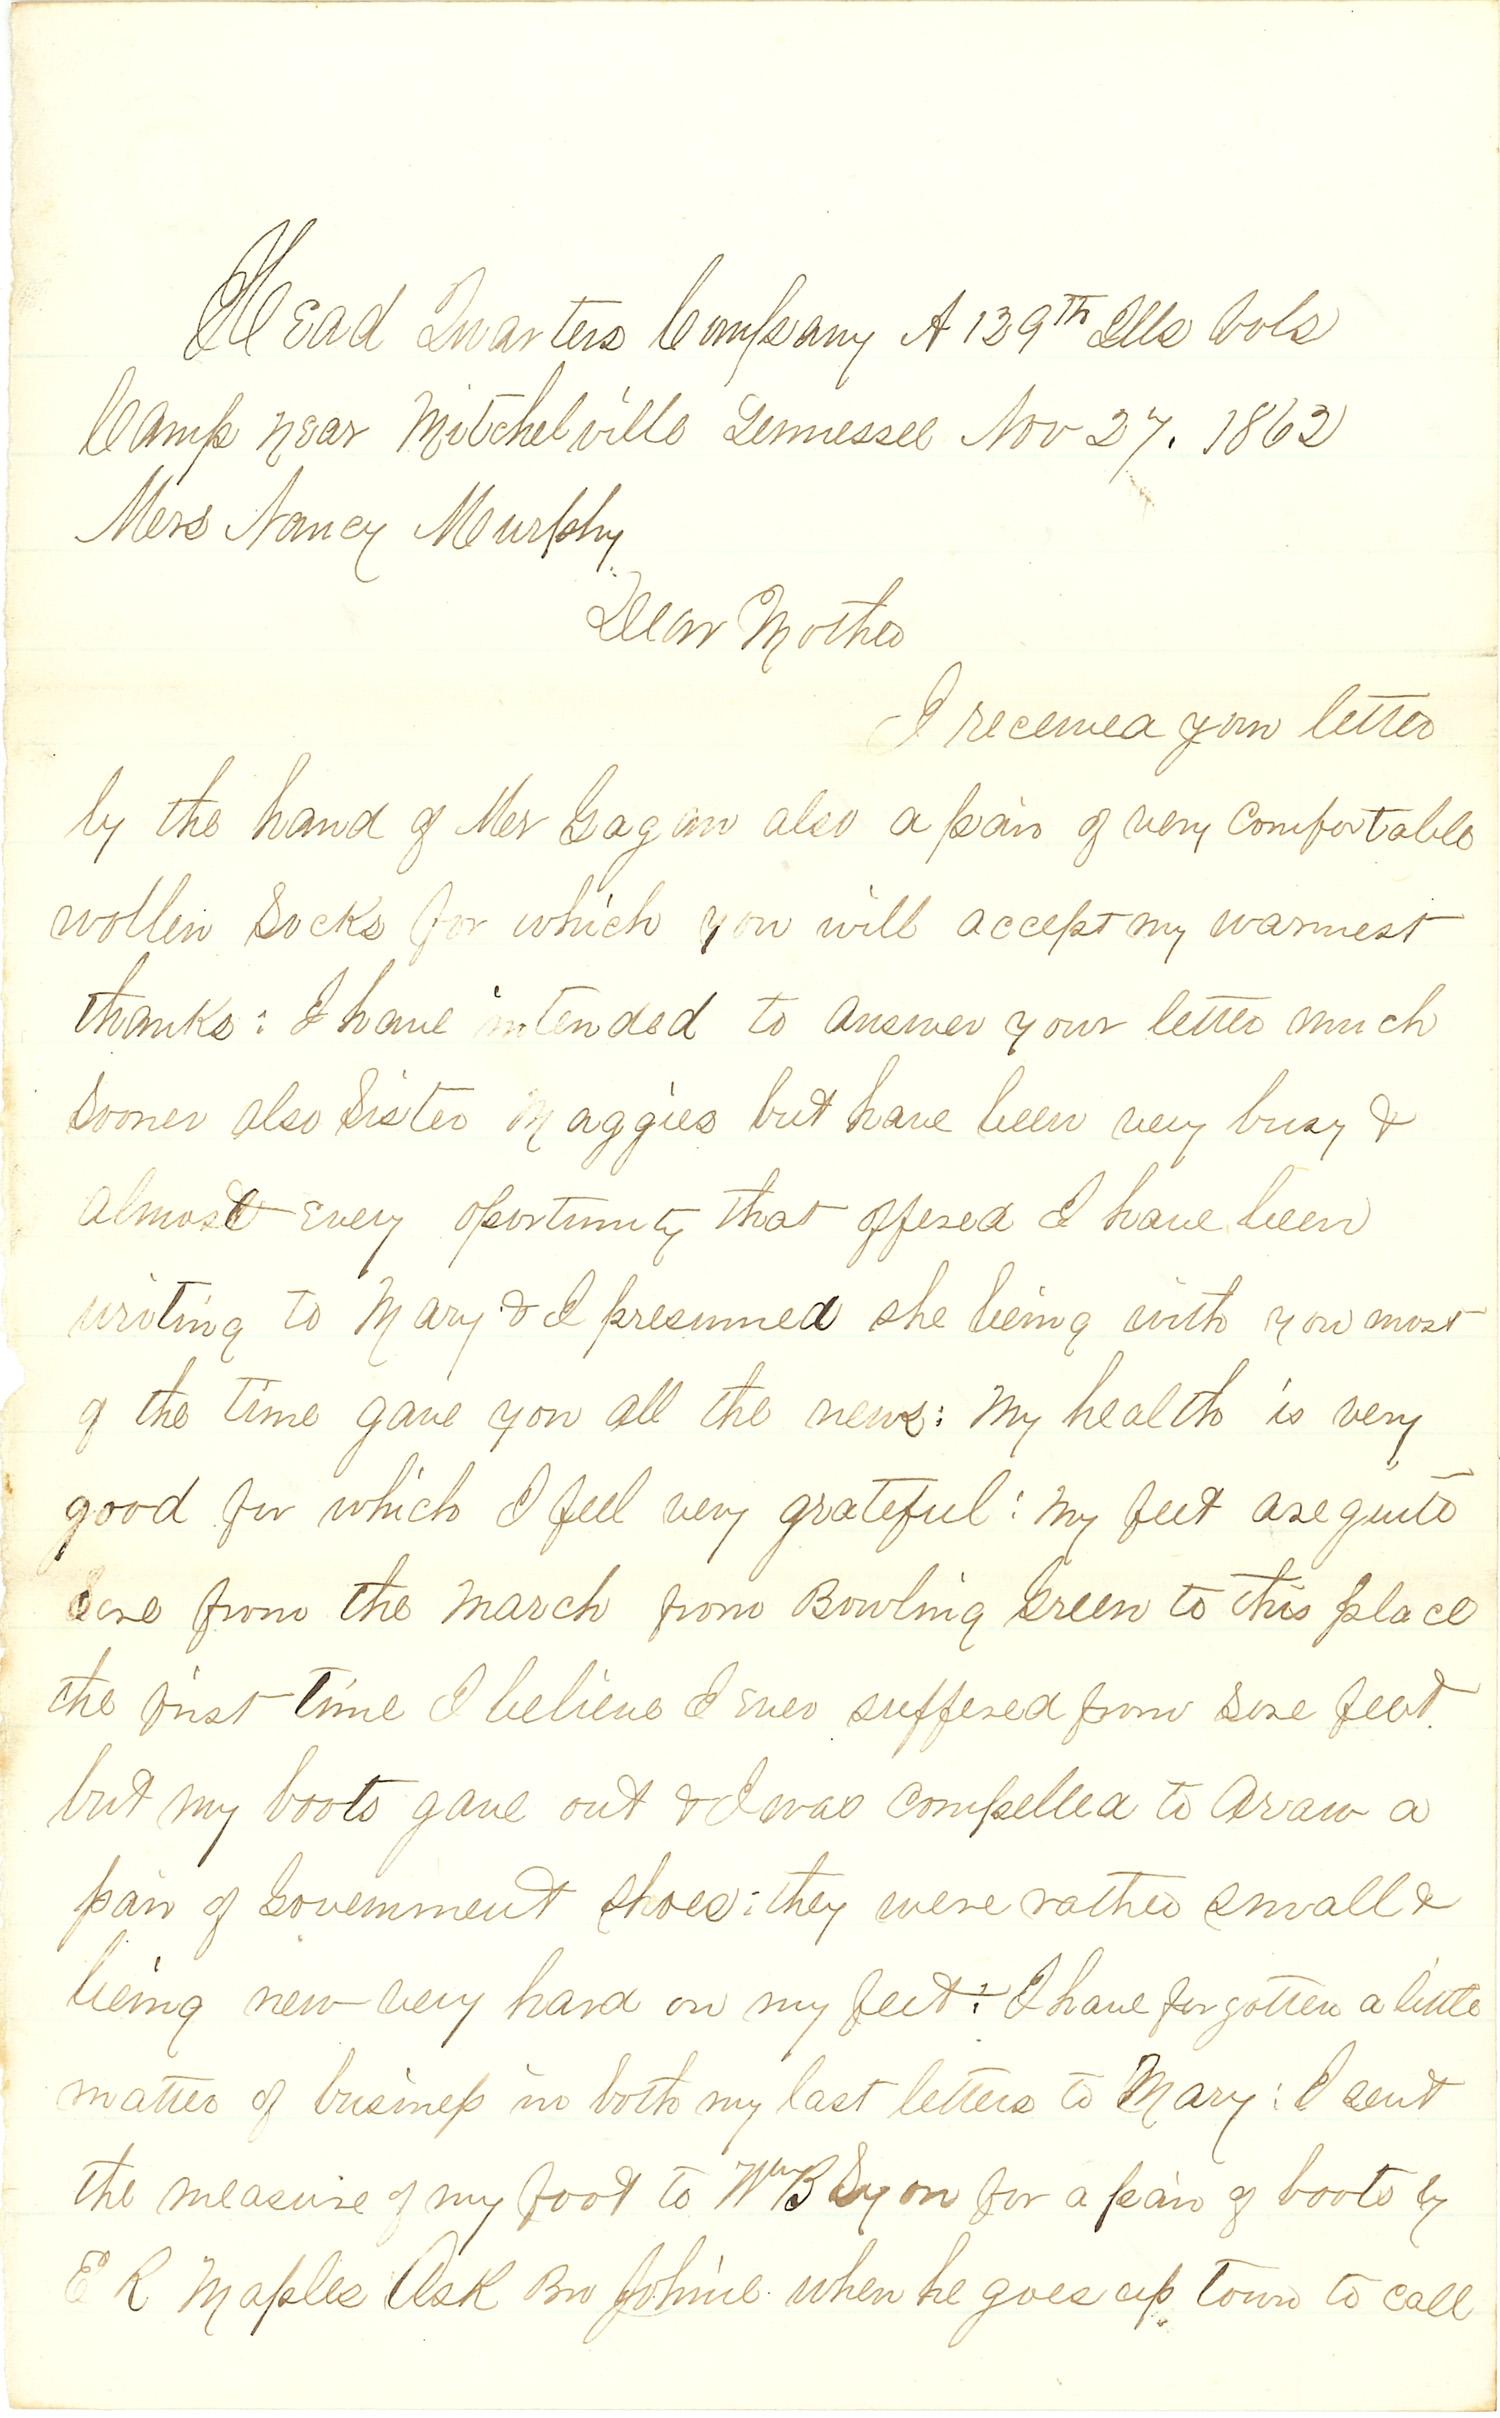 Joseph Culver Letter, November 26, 1862, Page 3